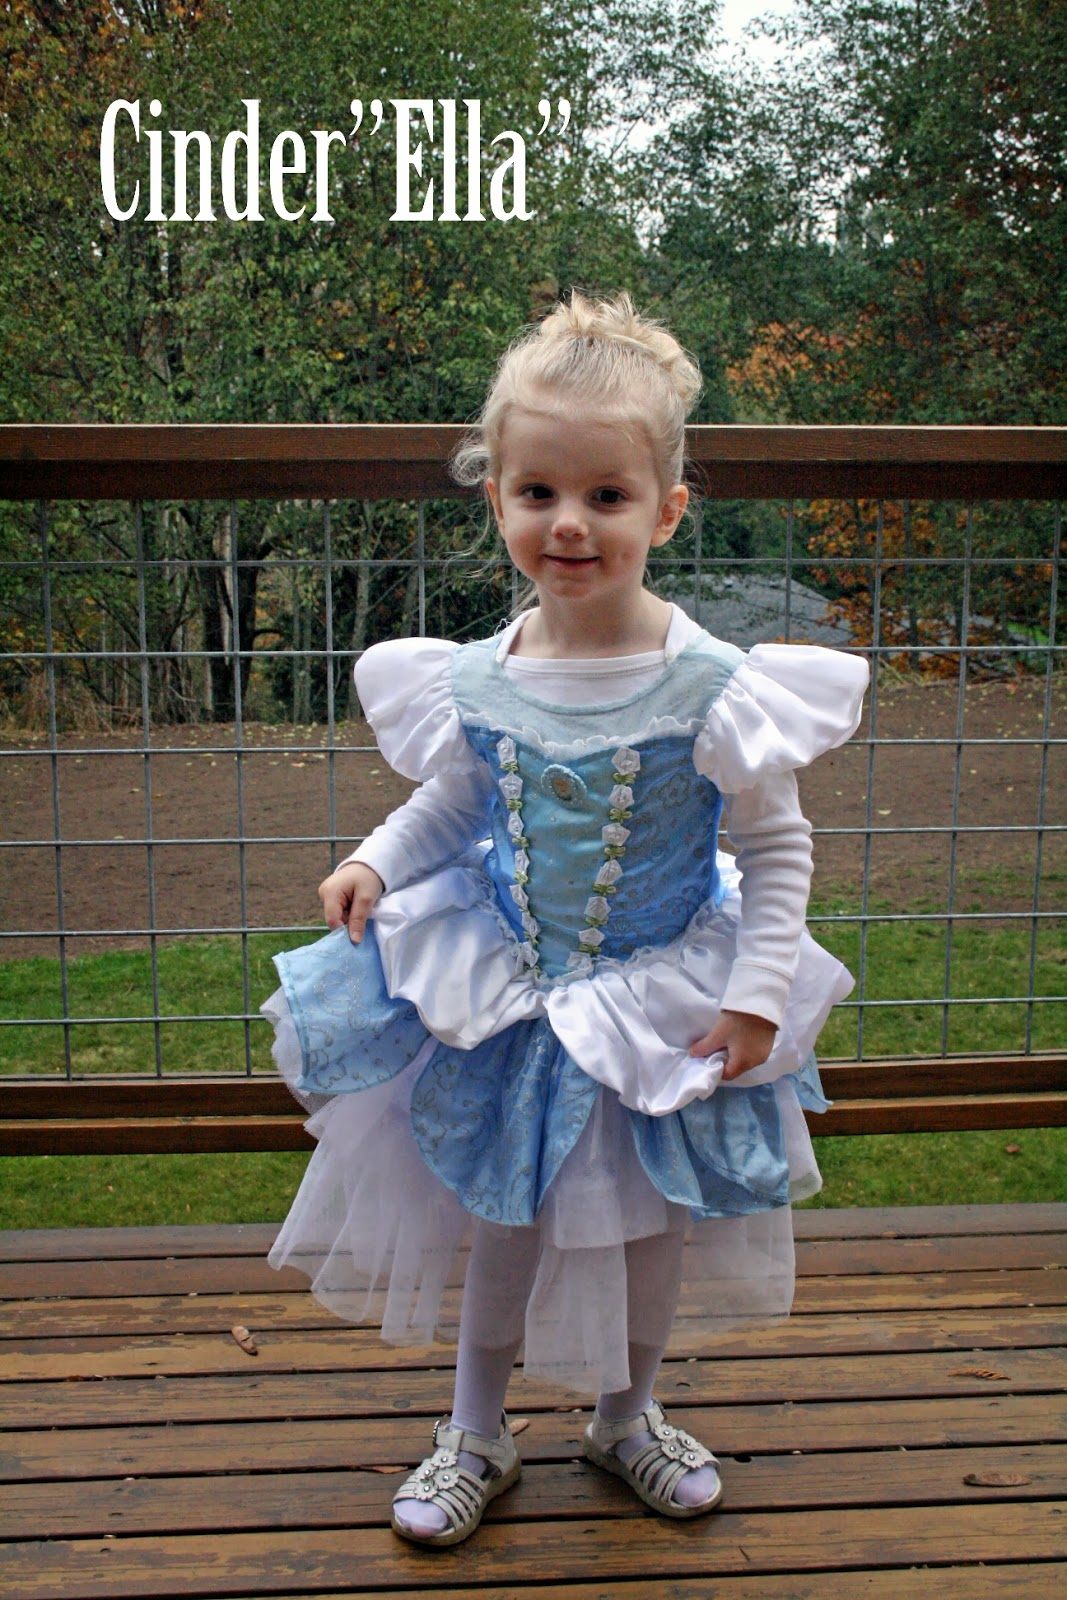 my 3 year old as cinderella her name is ella